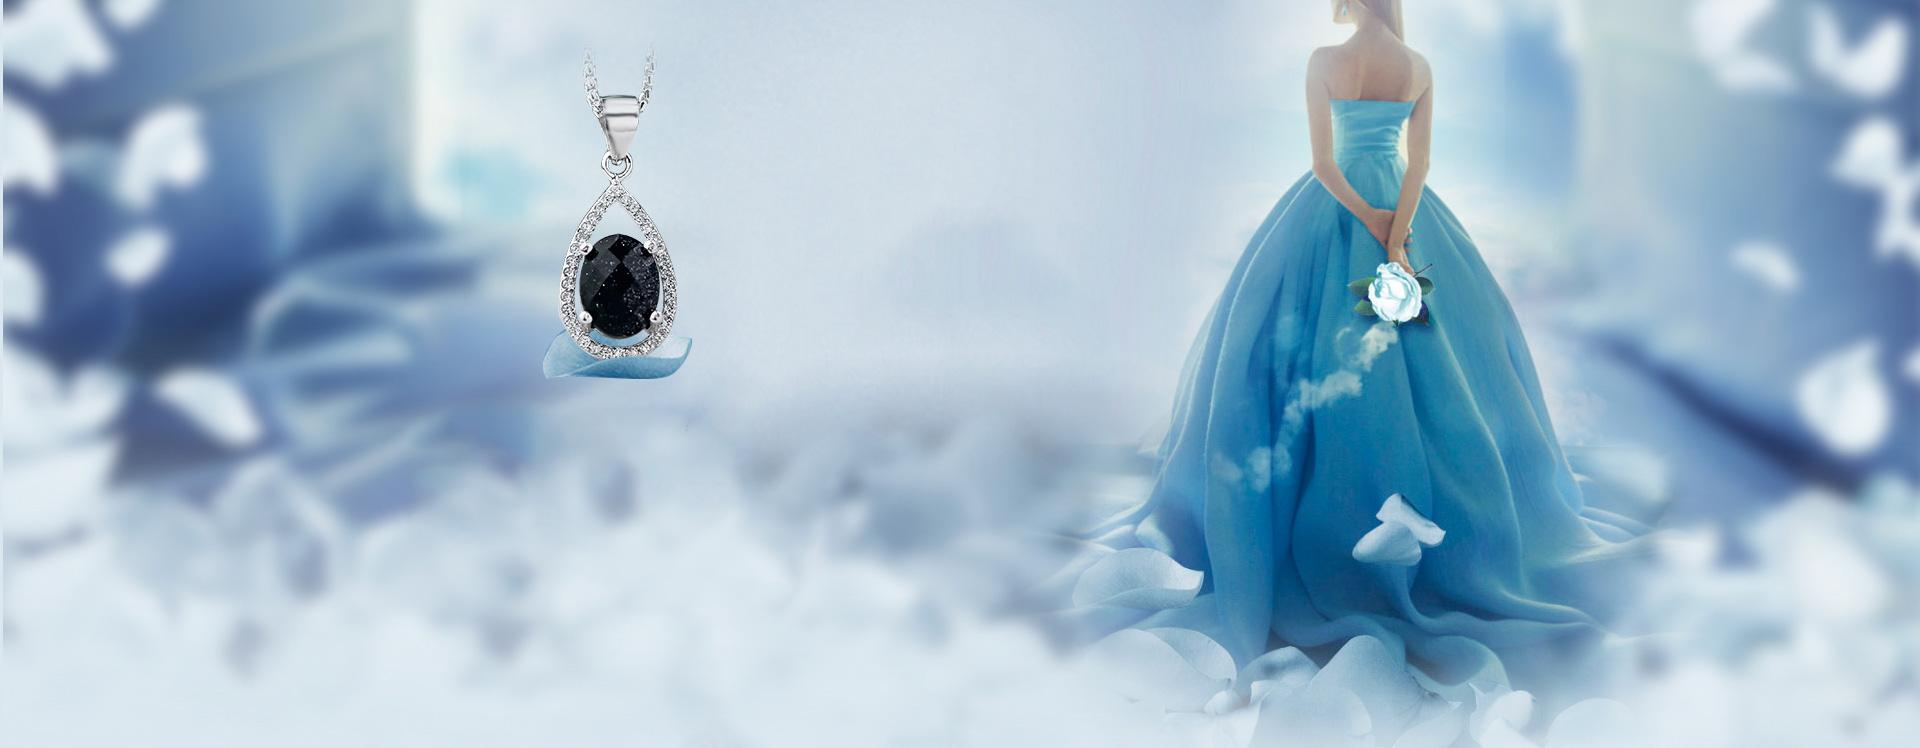 romantic blue jewelry dress background  crystal  sky blue